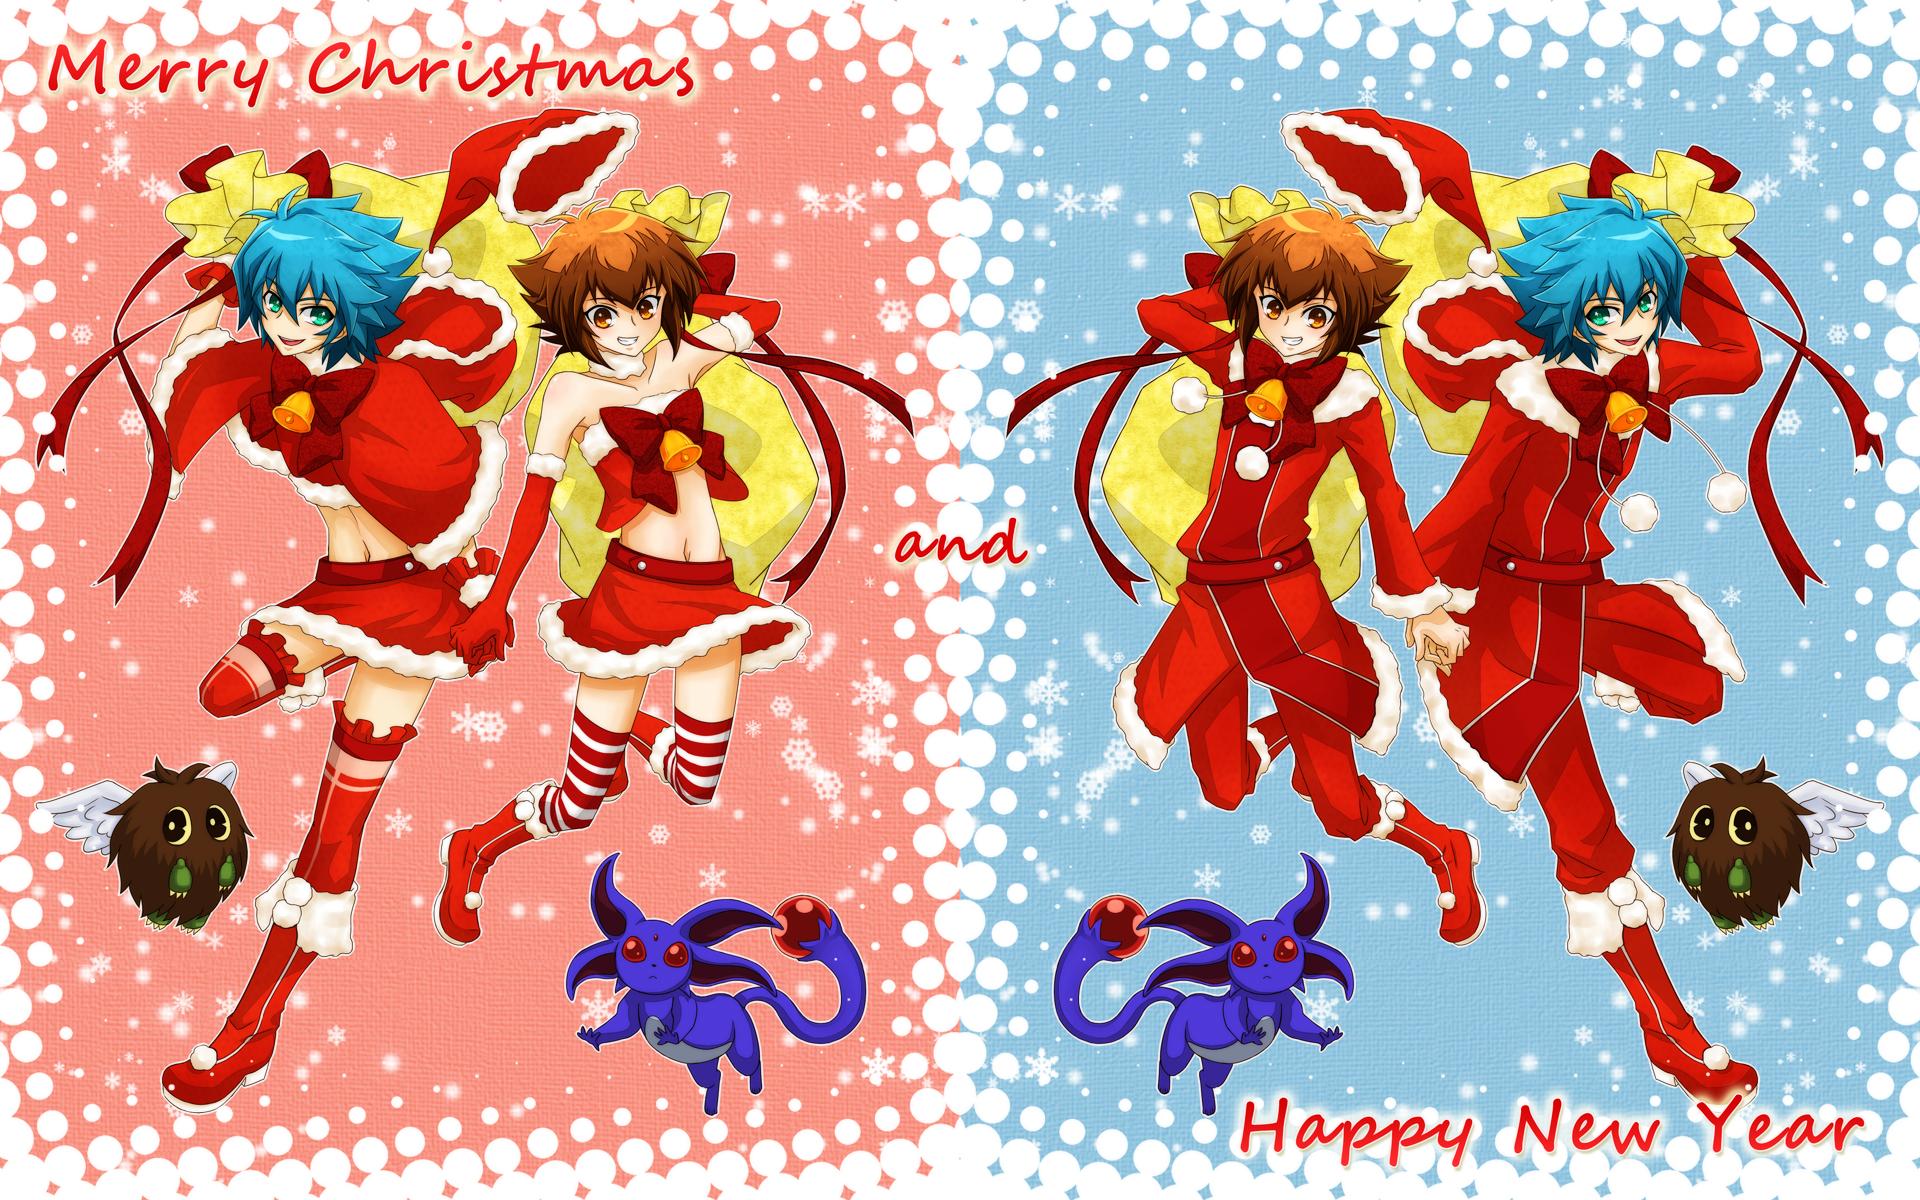 Yu-Gi-Oh! GX Wallpaper #2063855 - Zerochan Anime Image Board